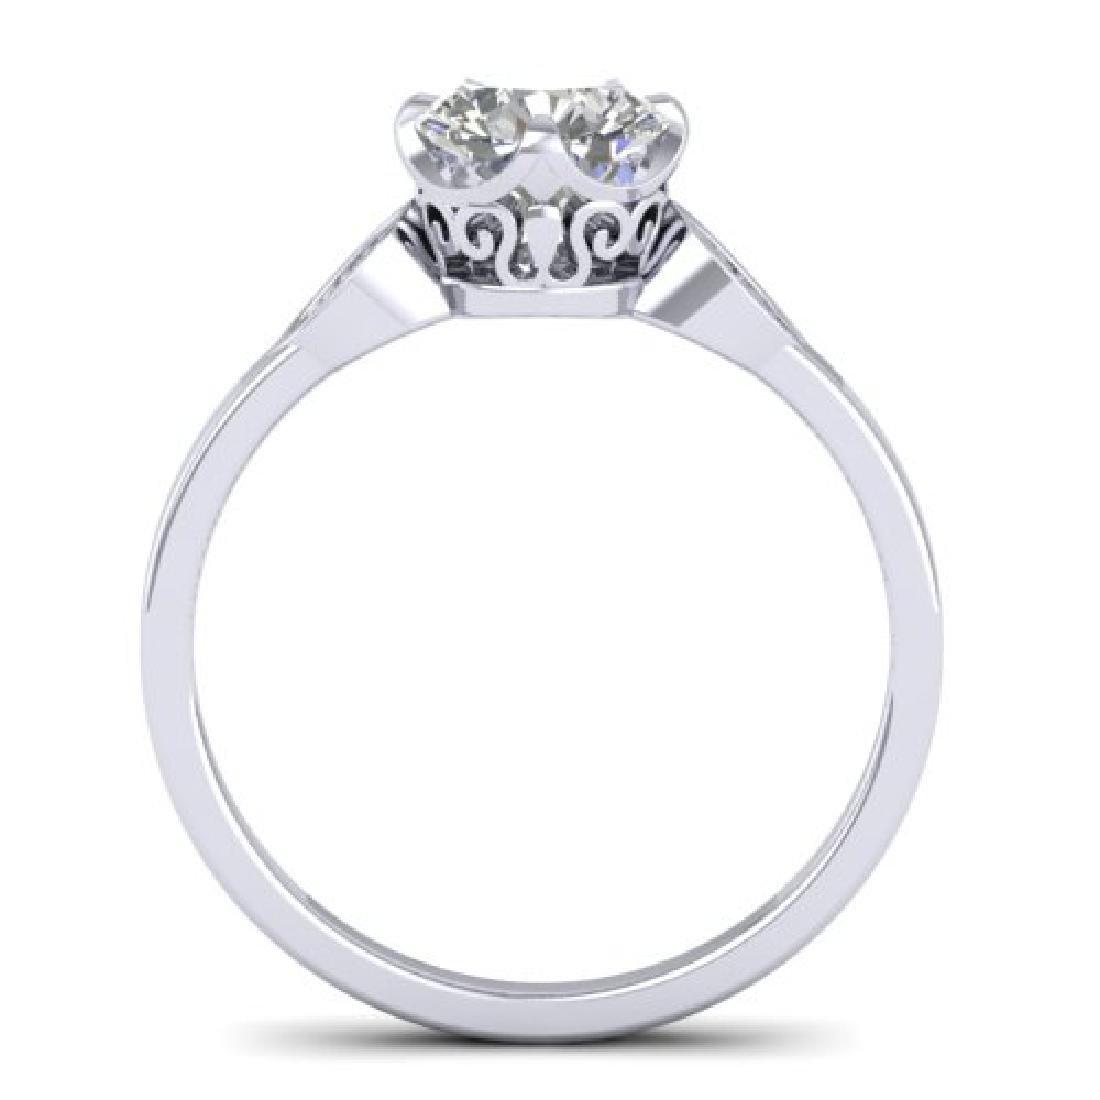 1.05 CTW Certified VS/SI Diamond Solitaire Art Deco - 3